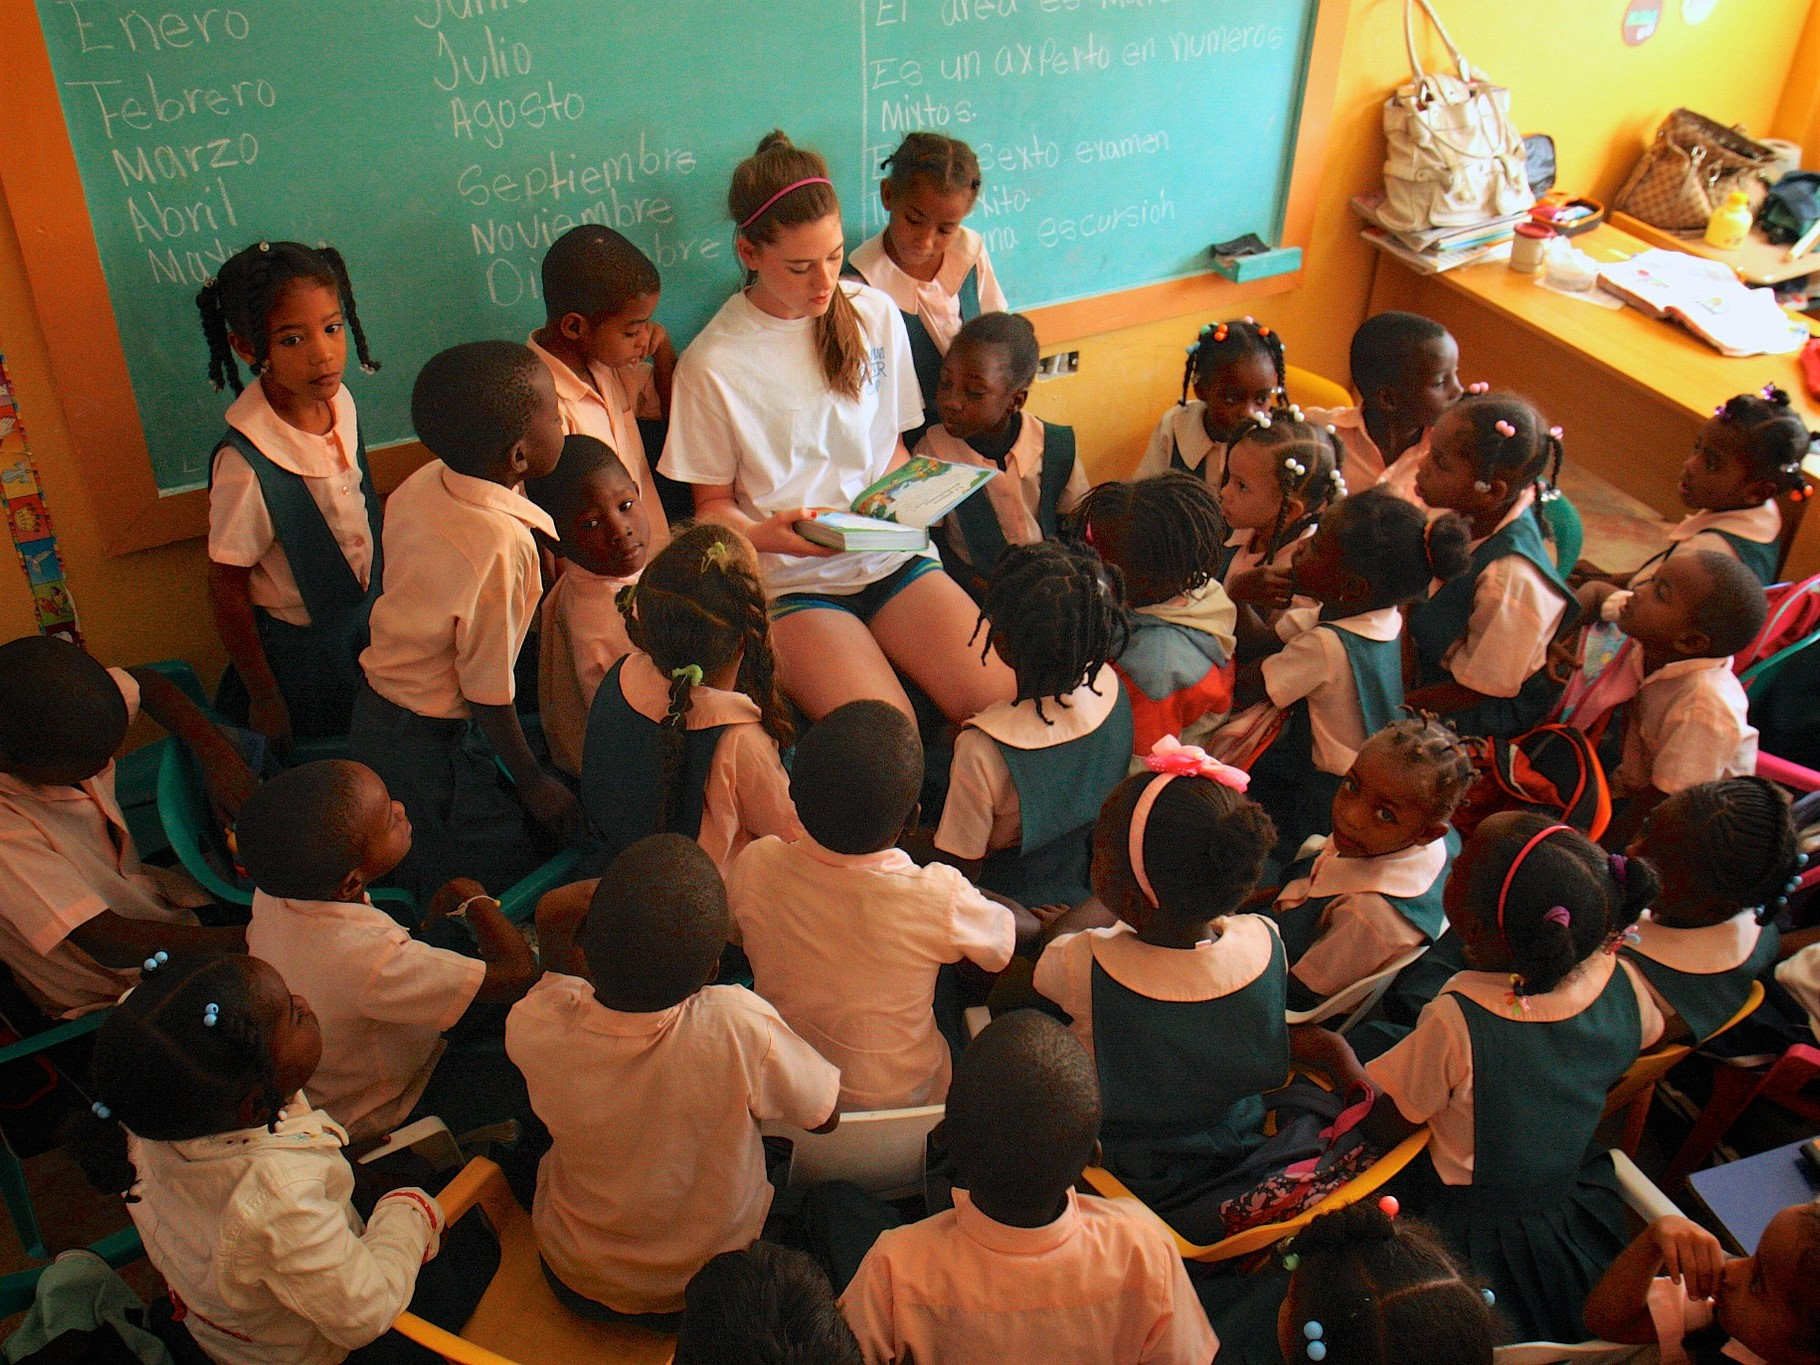 Classroom at the Joe Hartman School in La Romana, Dominican Republic